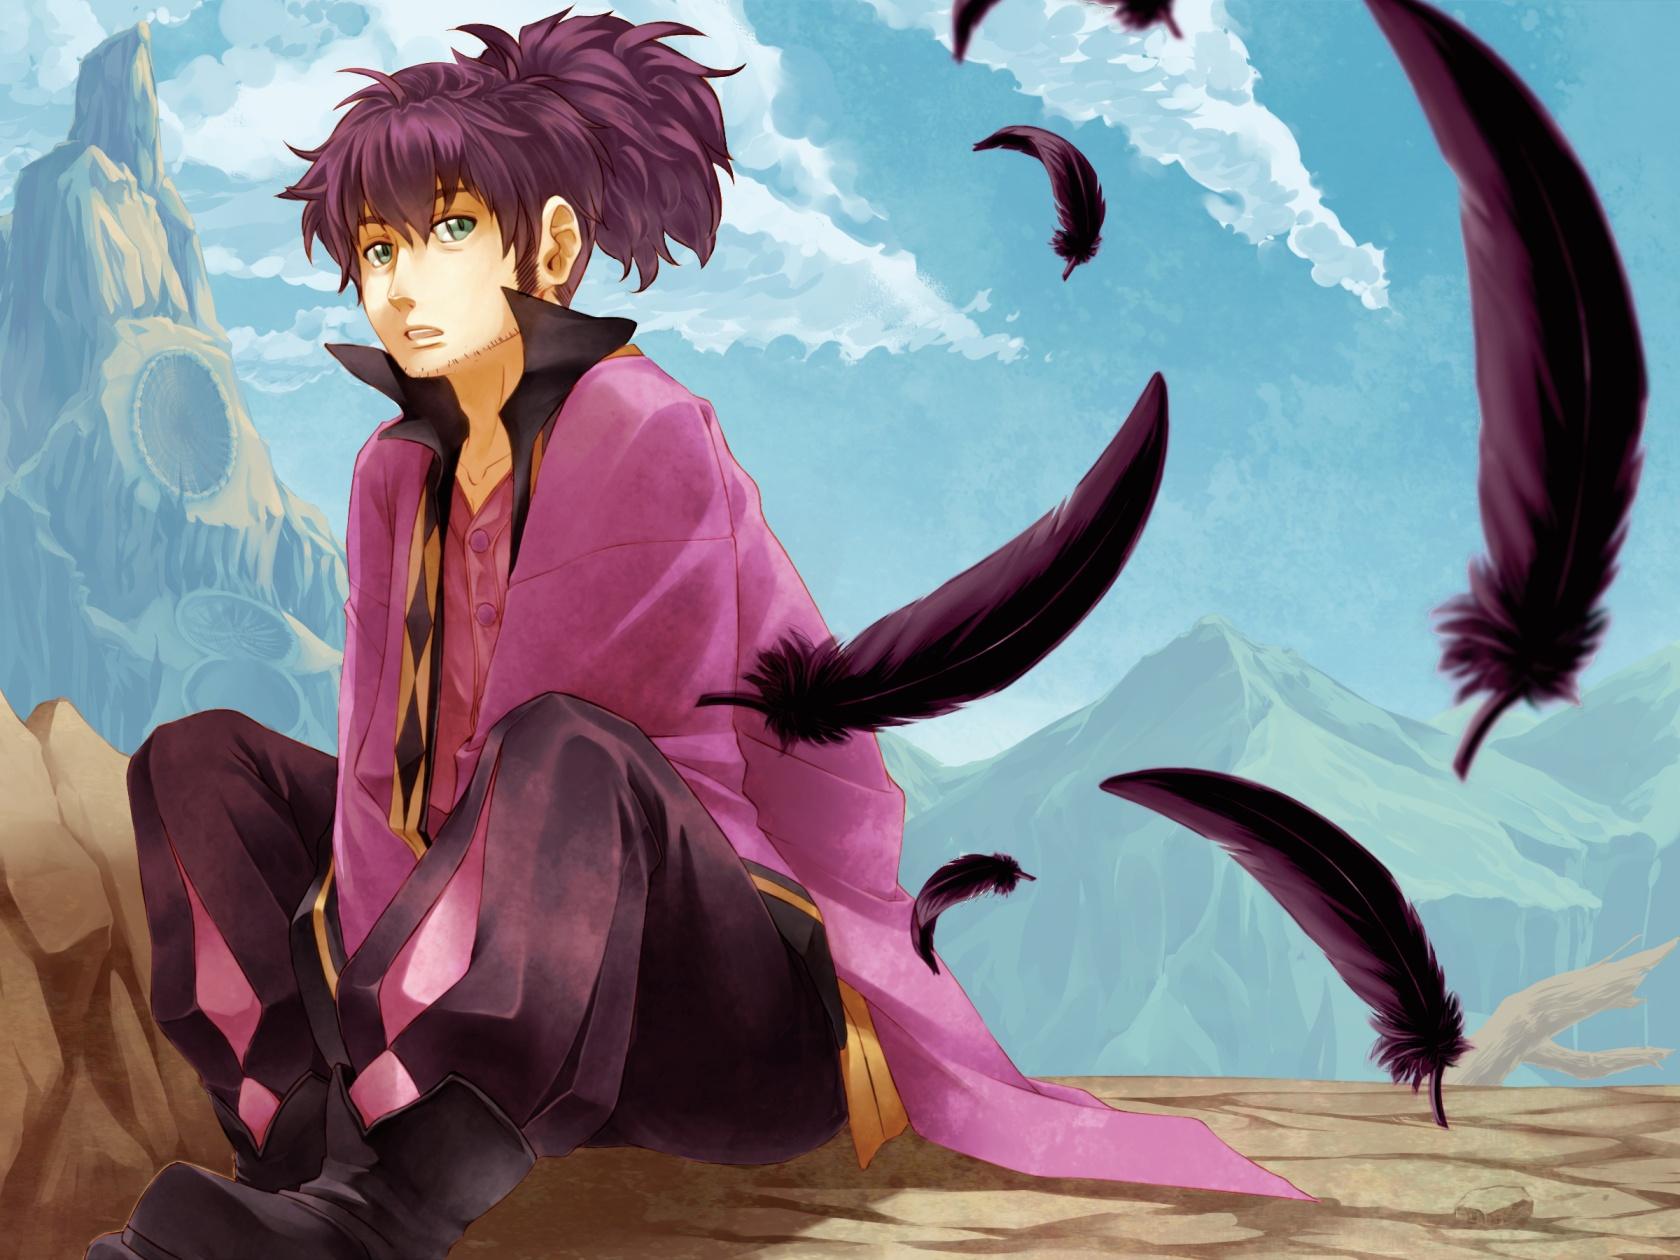 Tales Of Vesperia Raven Wallpaper 1680x1260 163447 Wallpaperup